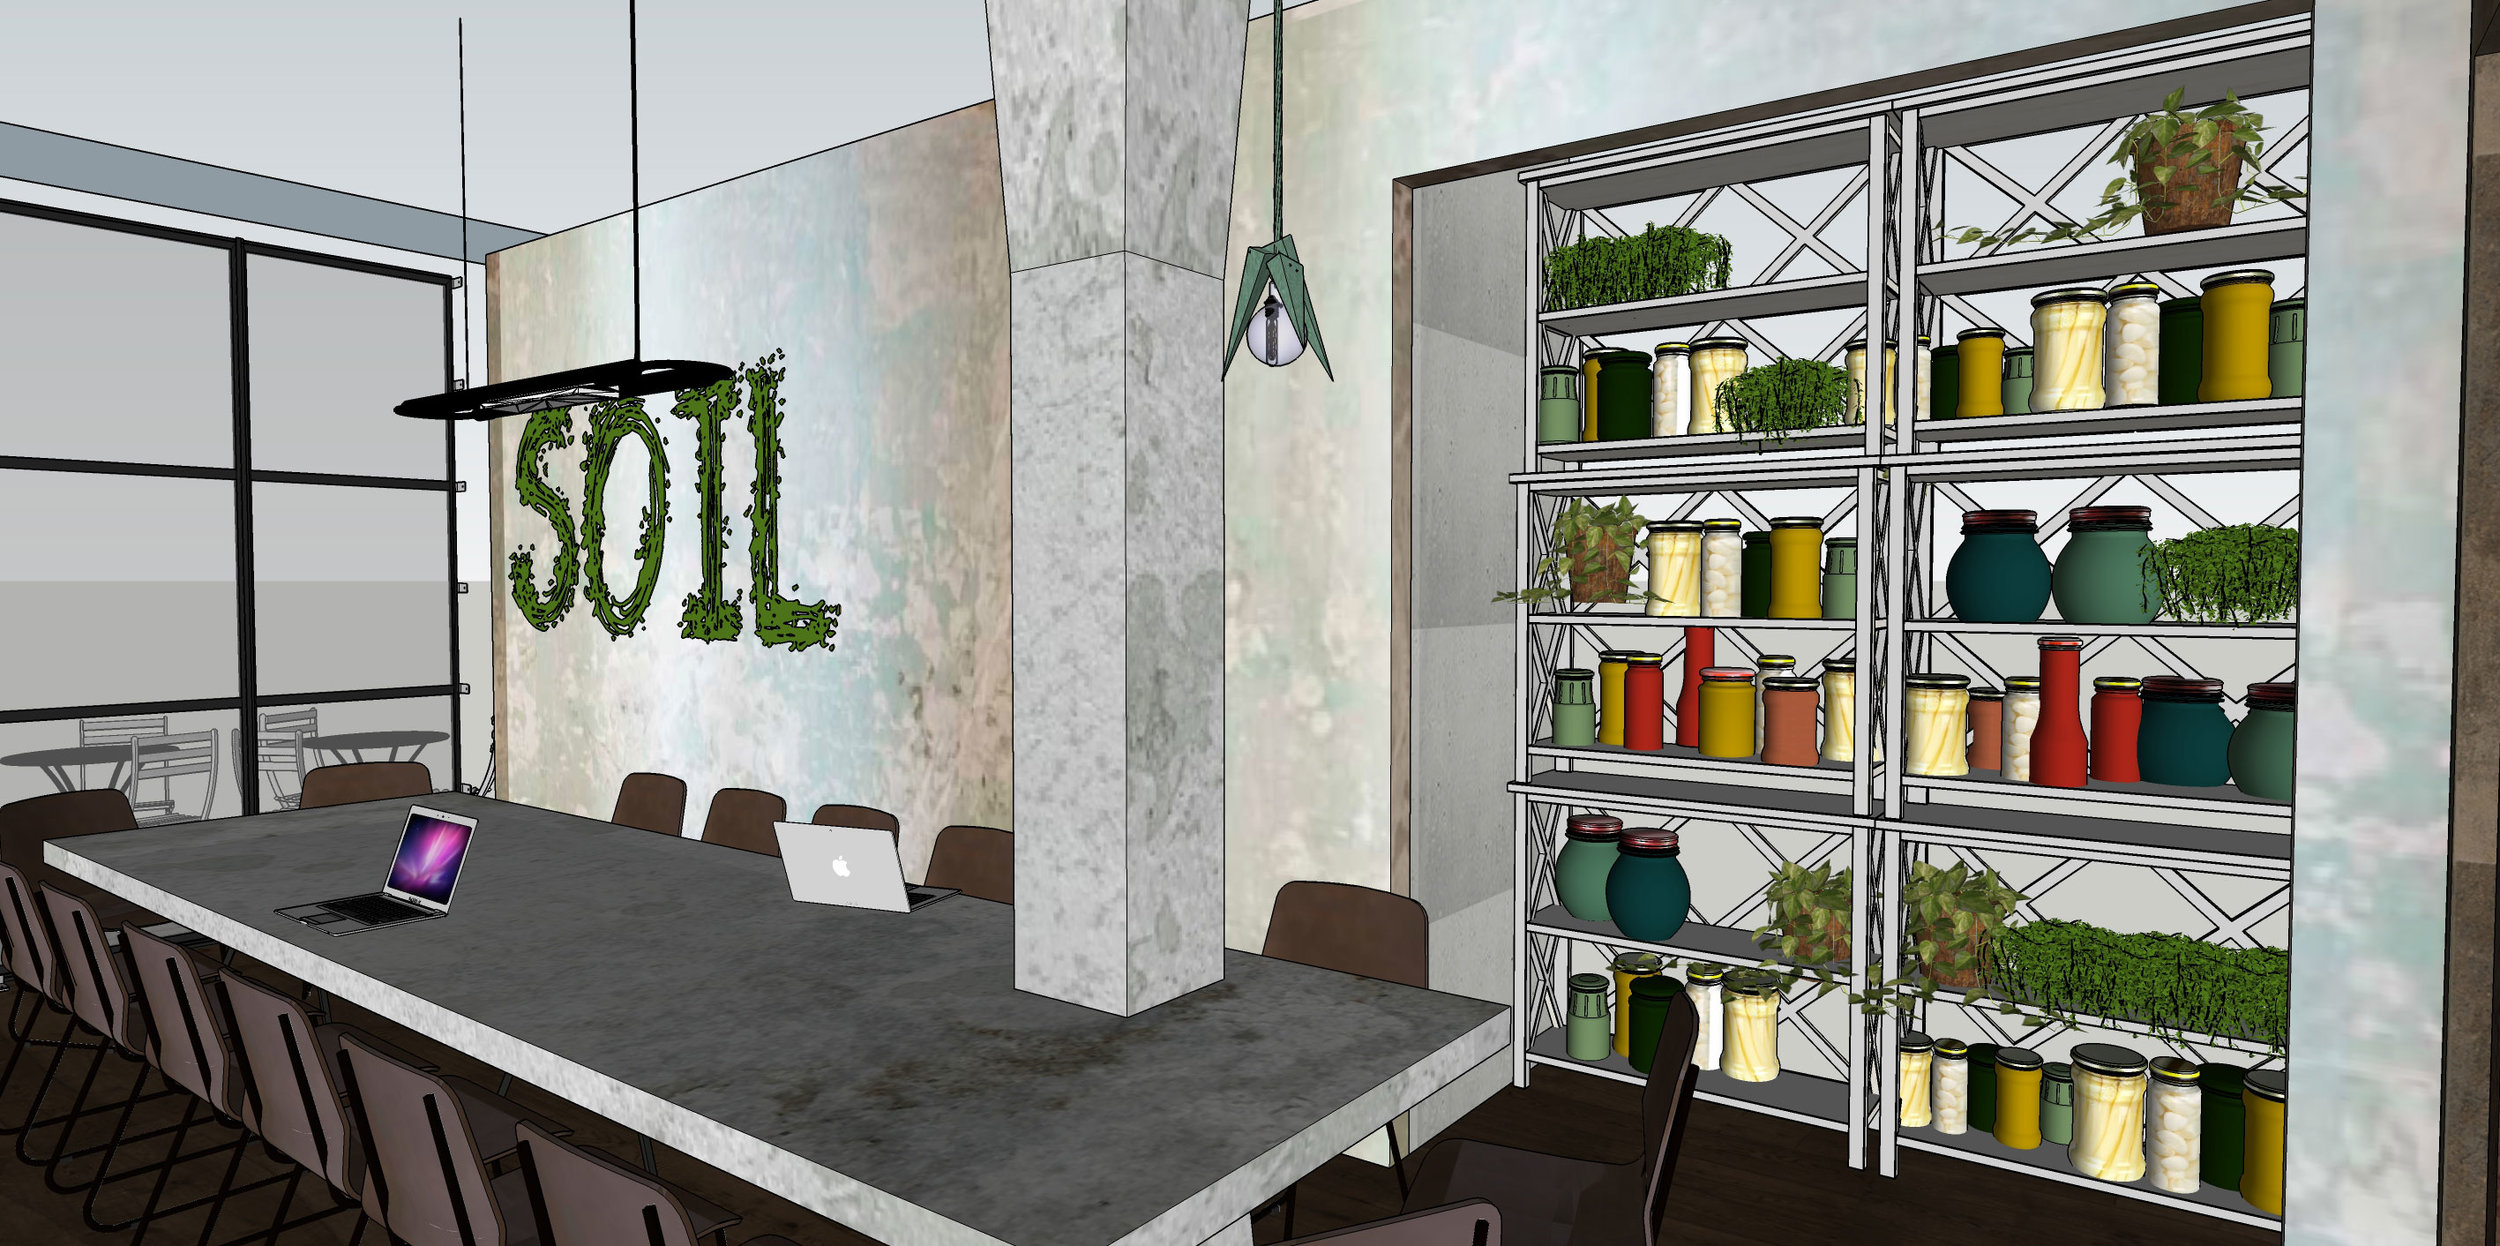 StudioNoun-InteriorDesignProject-Restaurant-Soil_6.jpg